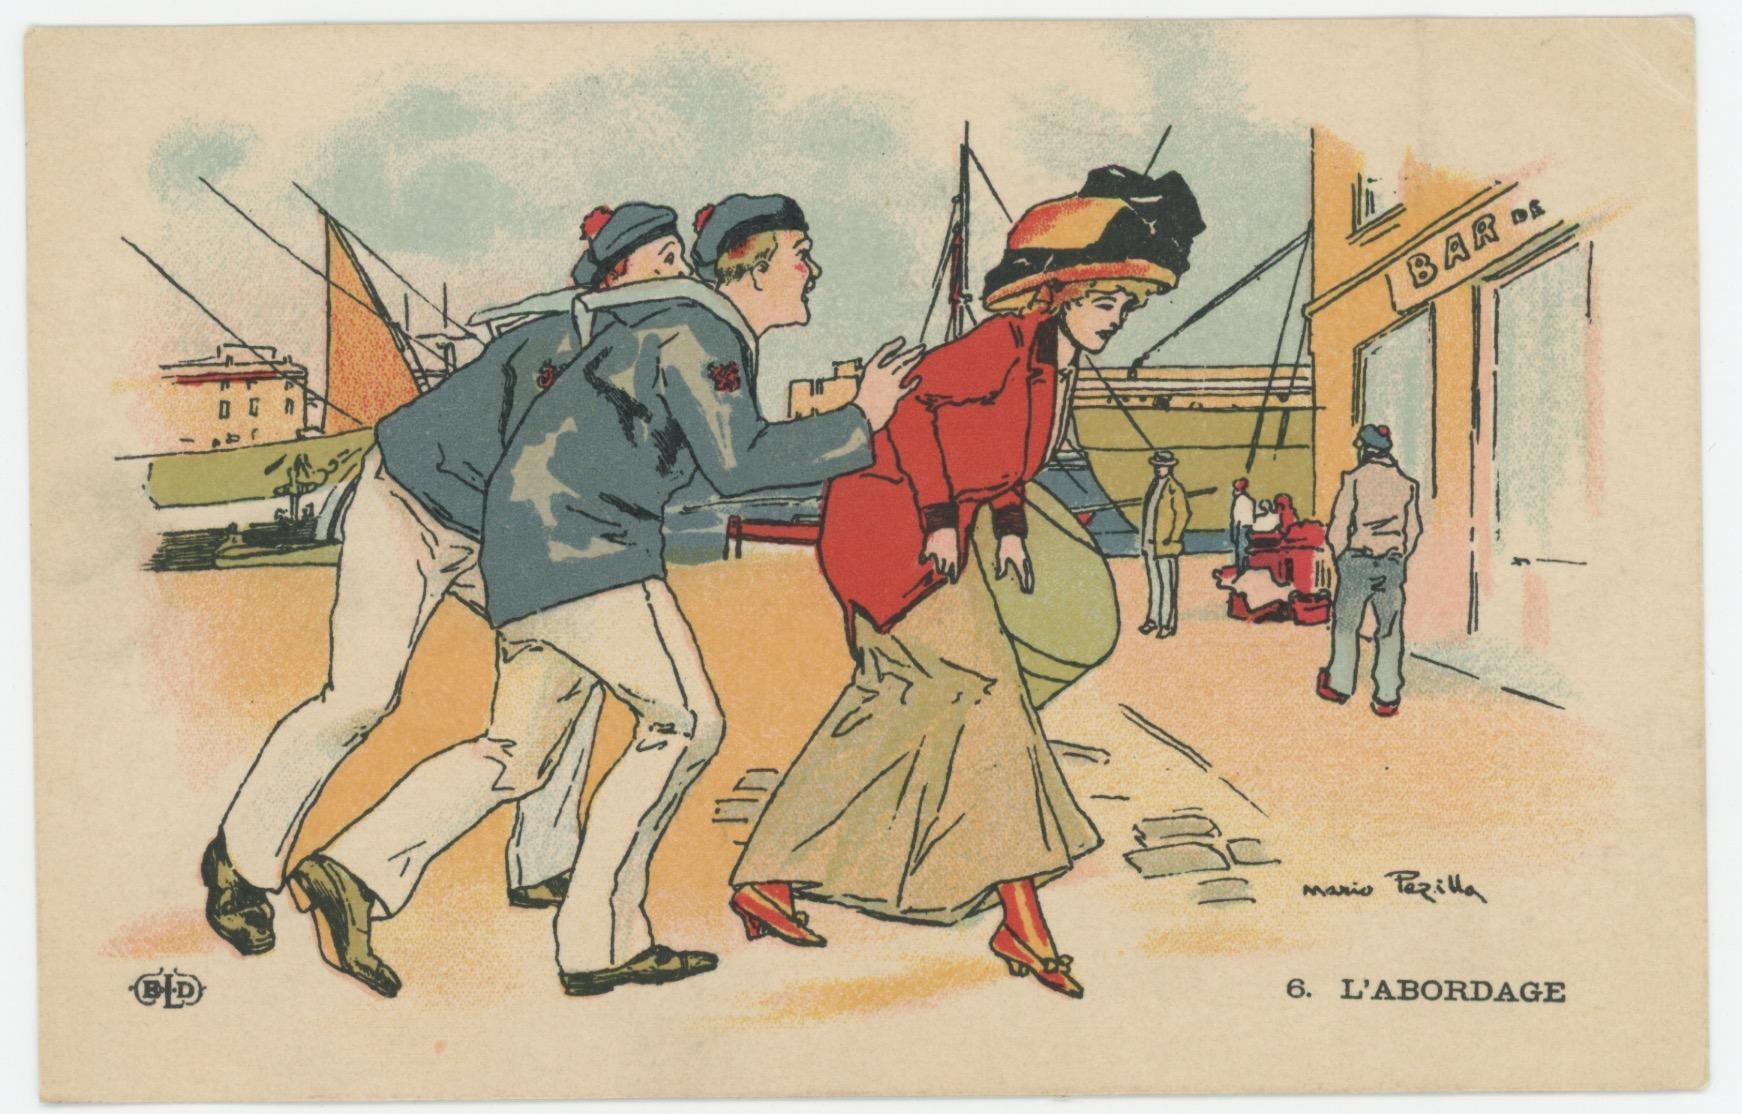 Lot 12 Cartes Postale Illustrée - Marine Française - Marin - Port - MARIO PEZILLA (actif vers 1900 ) - La vie du Marin